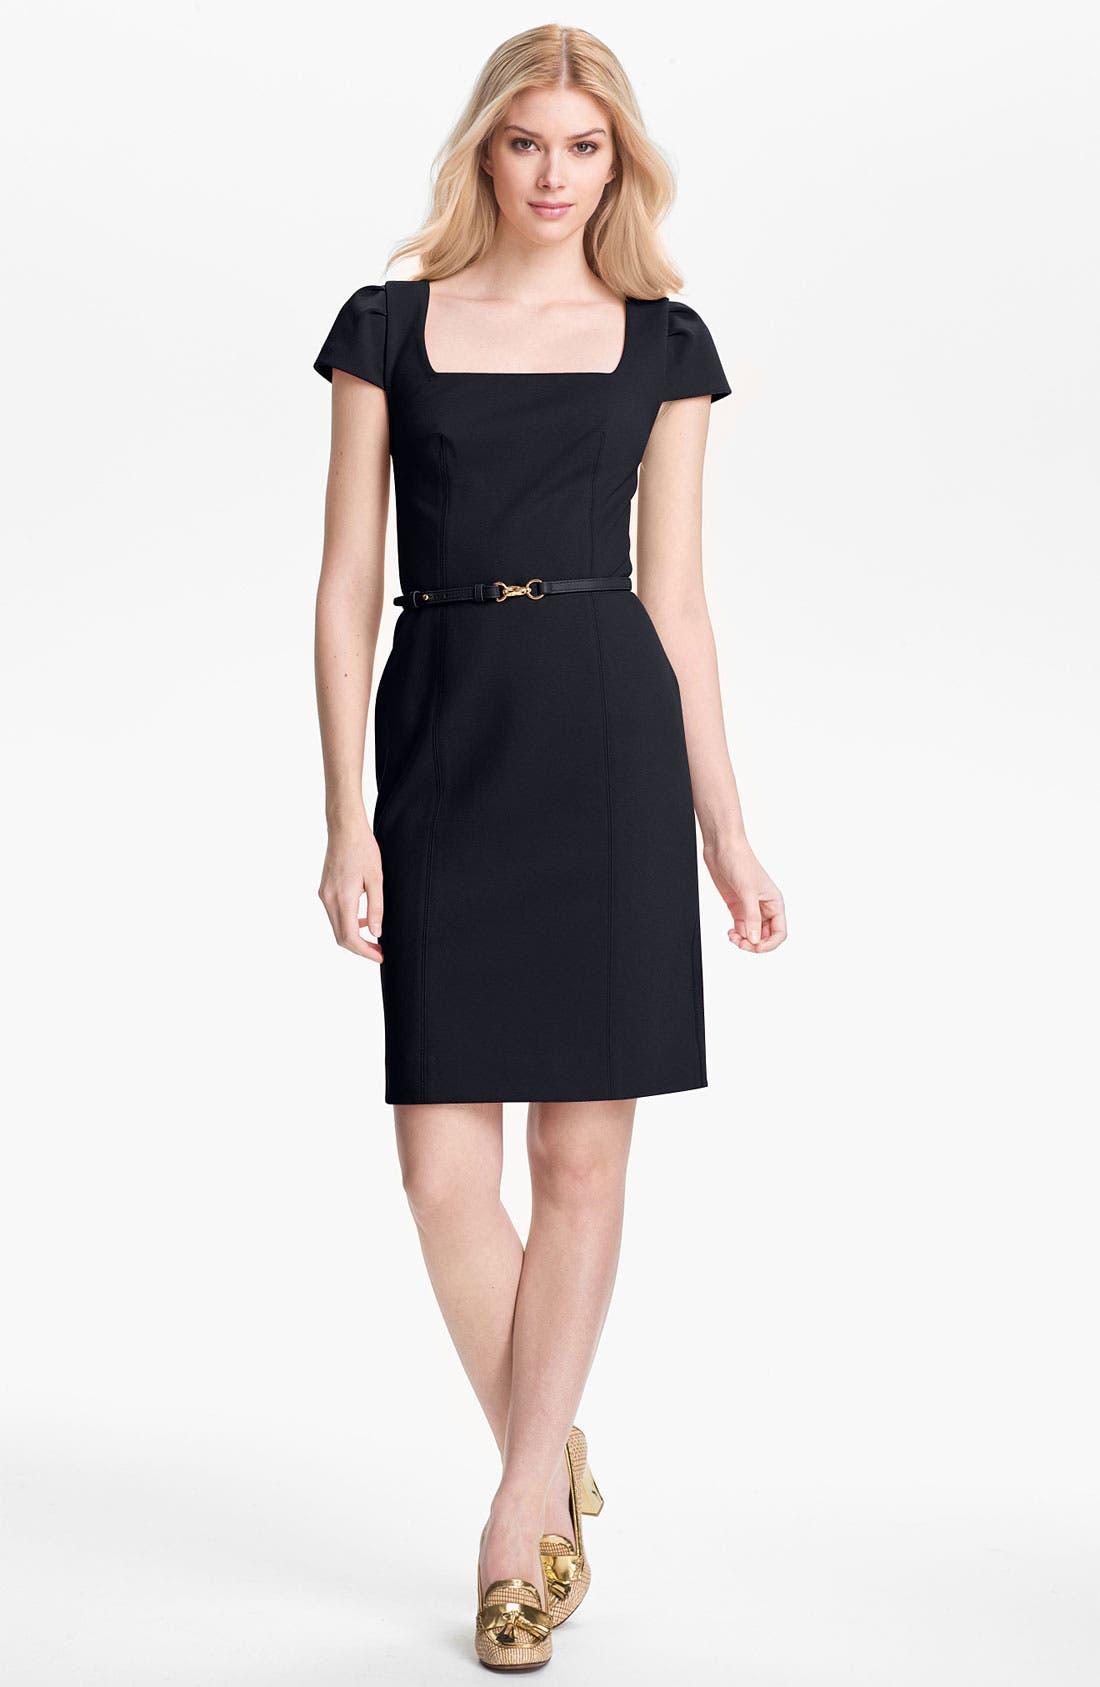 Alternate Image 1 Selected - Tory Burch 'Heather' Stretch Sheath Dress